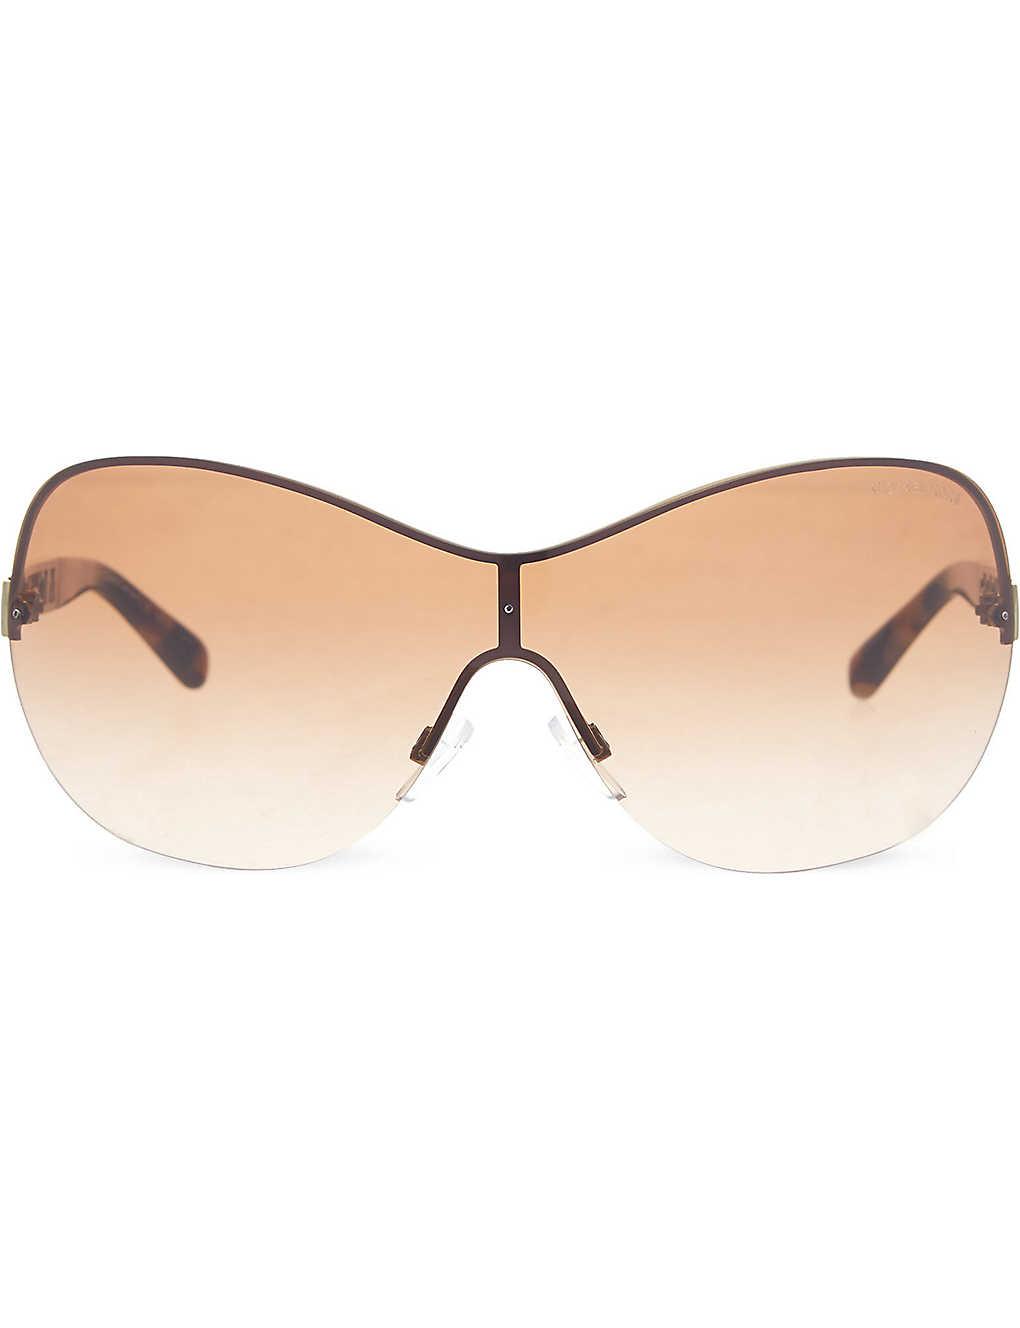 3454a6ec1470 MICHAEL KORS - MK5002 Grand Canyon sunglasses | Selfridges.com